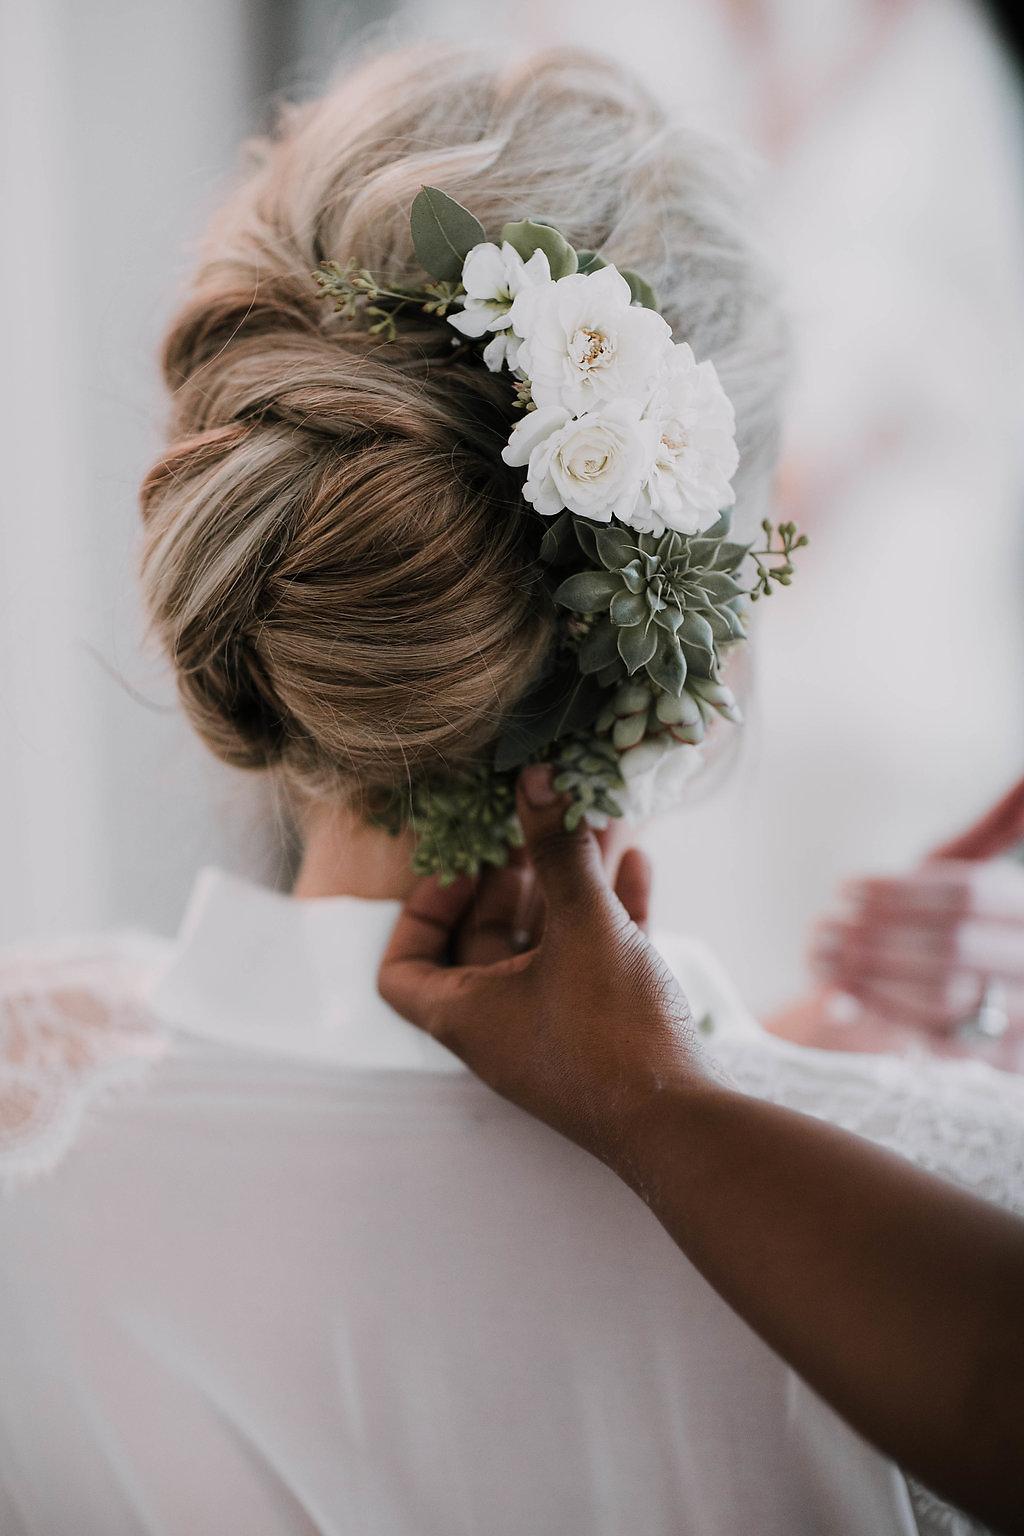 Woodway_Seattle_Wedding_Mark+Patricia_by_Adina_Preston_Weddings_117.JPG